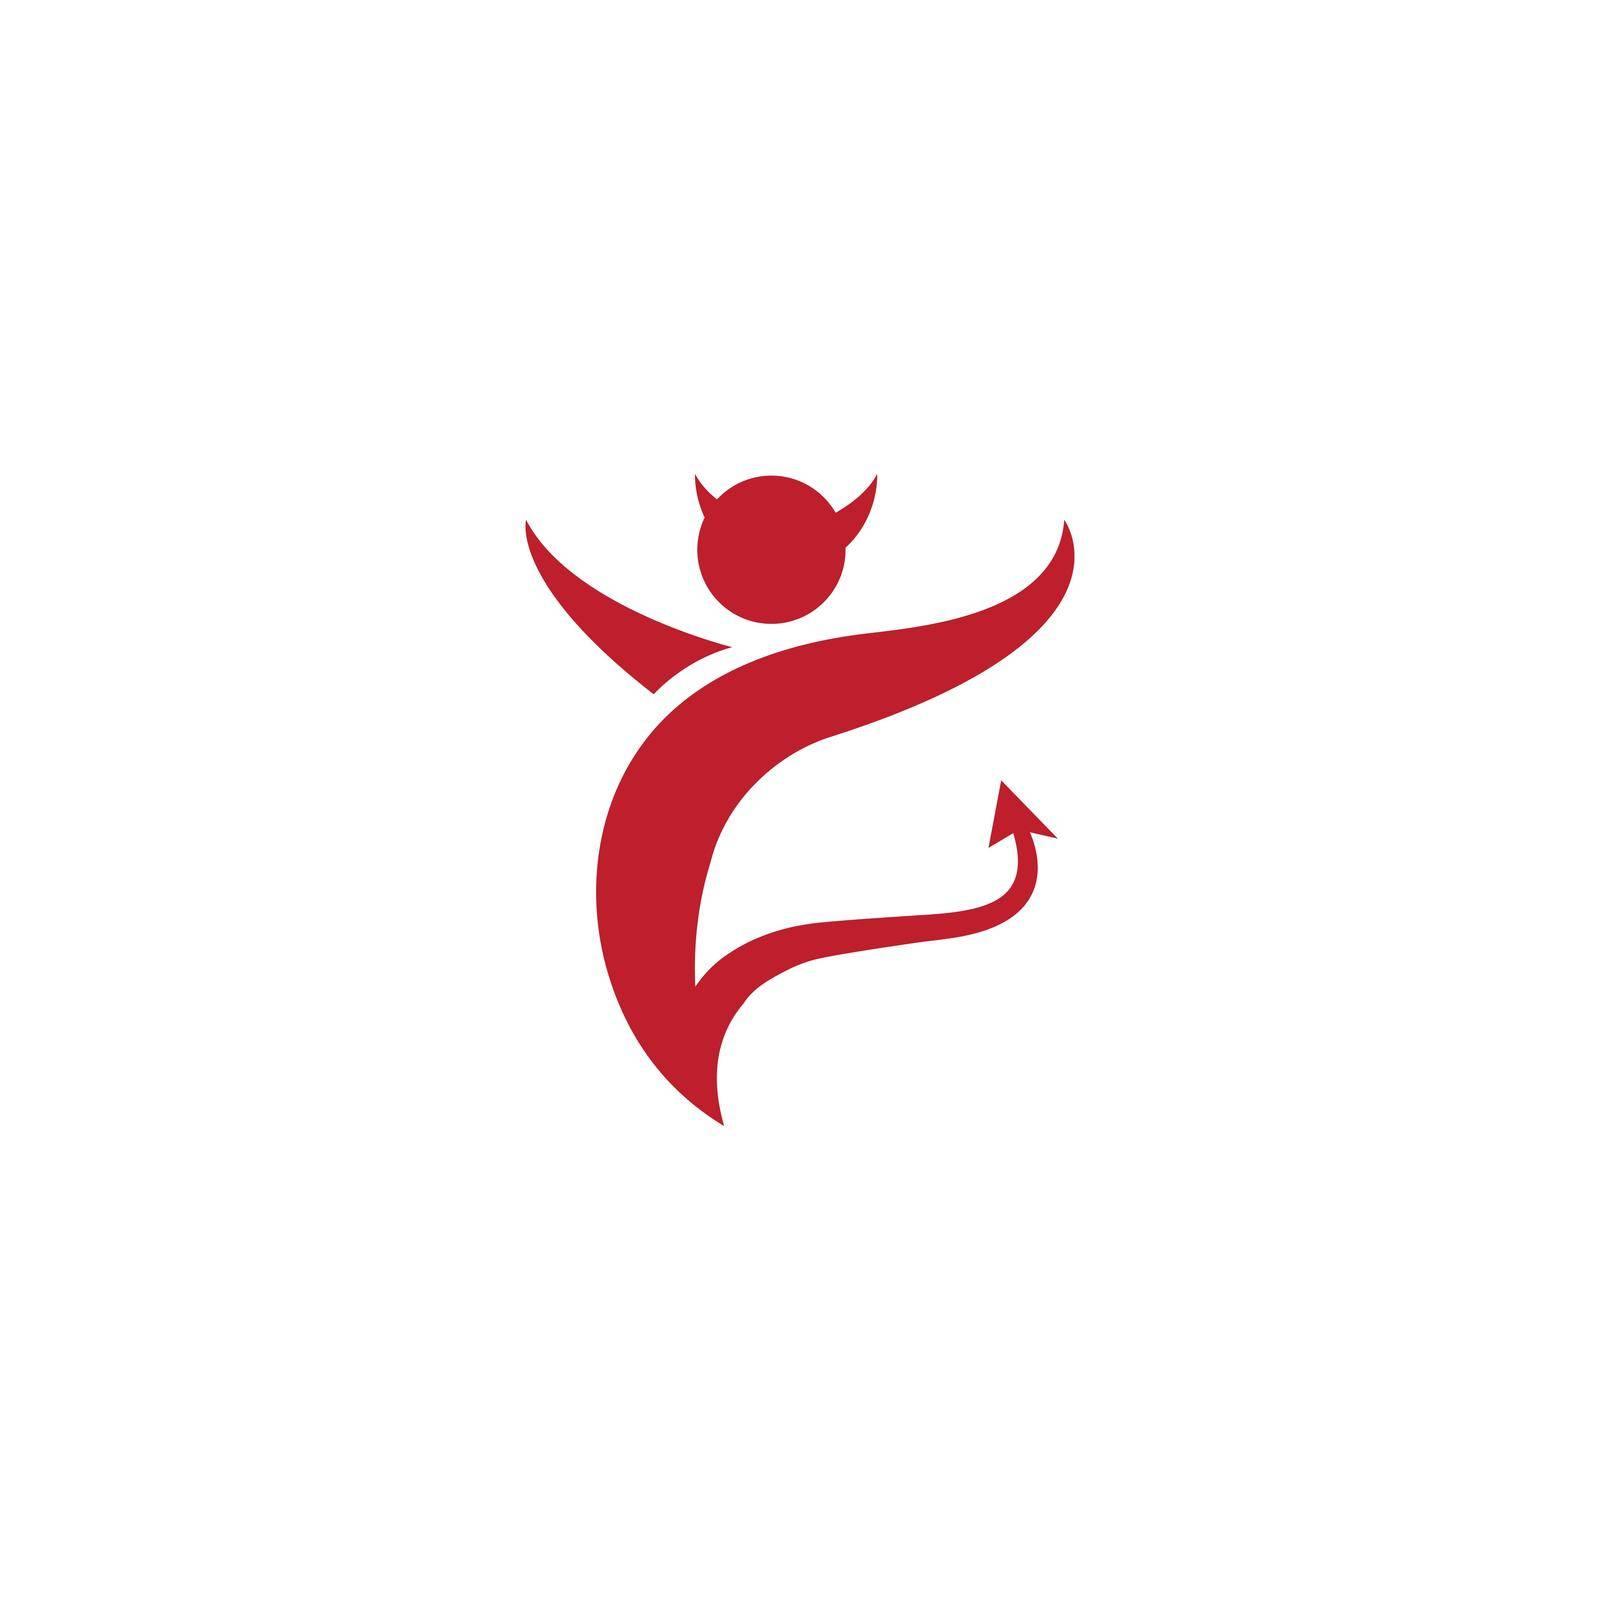 Devil logo ilustration vector template